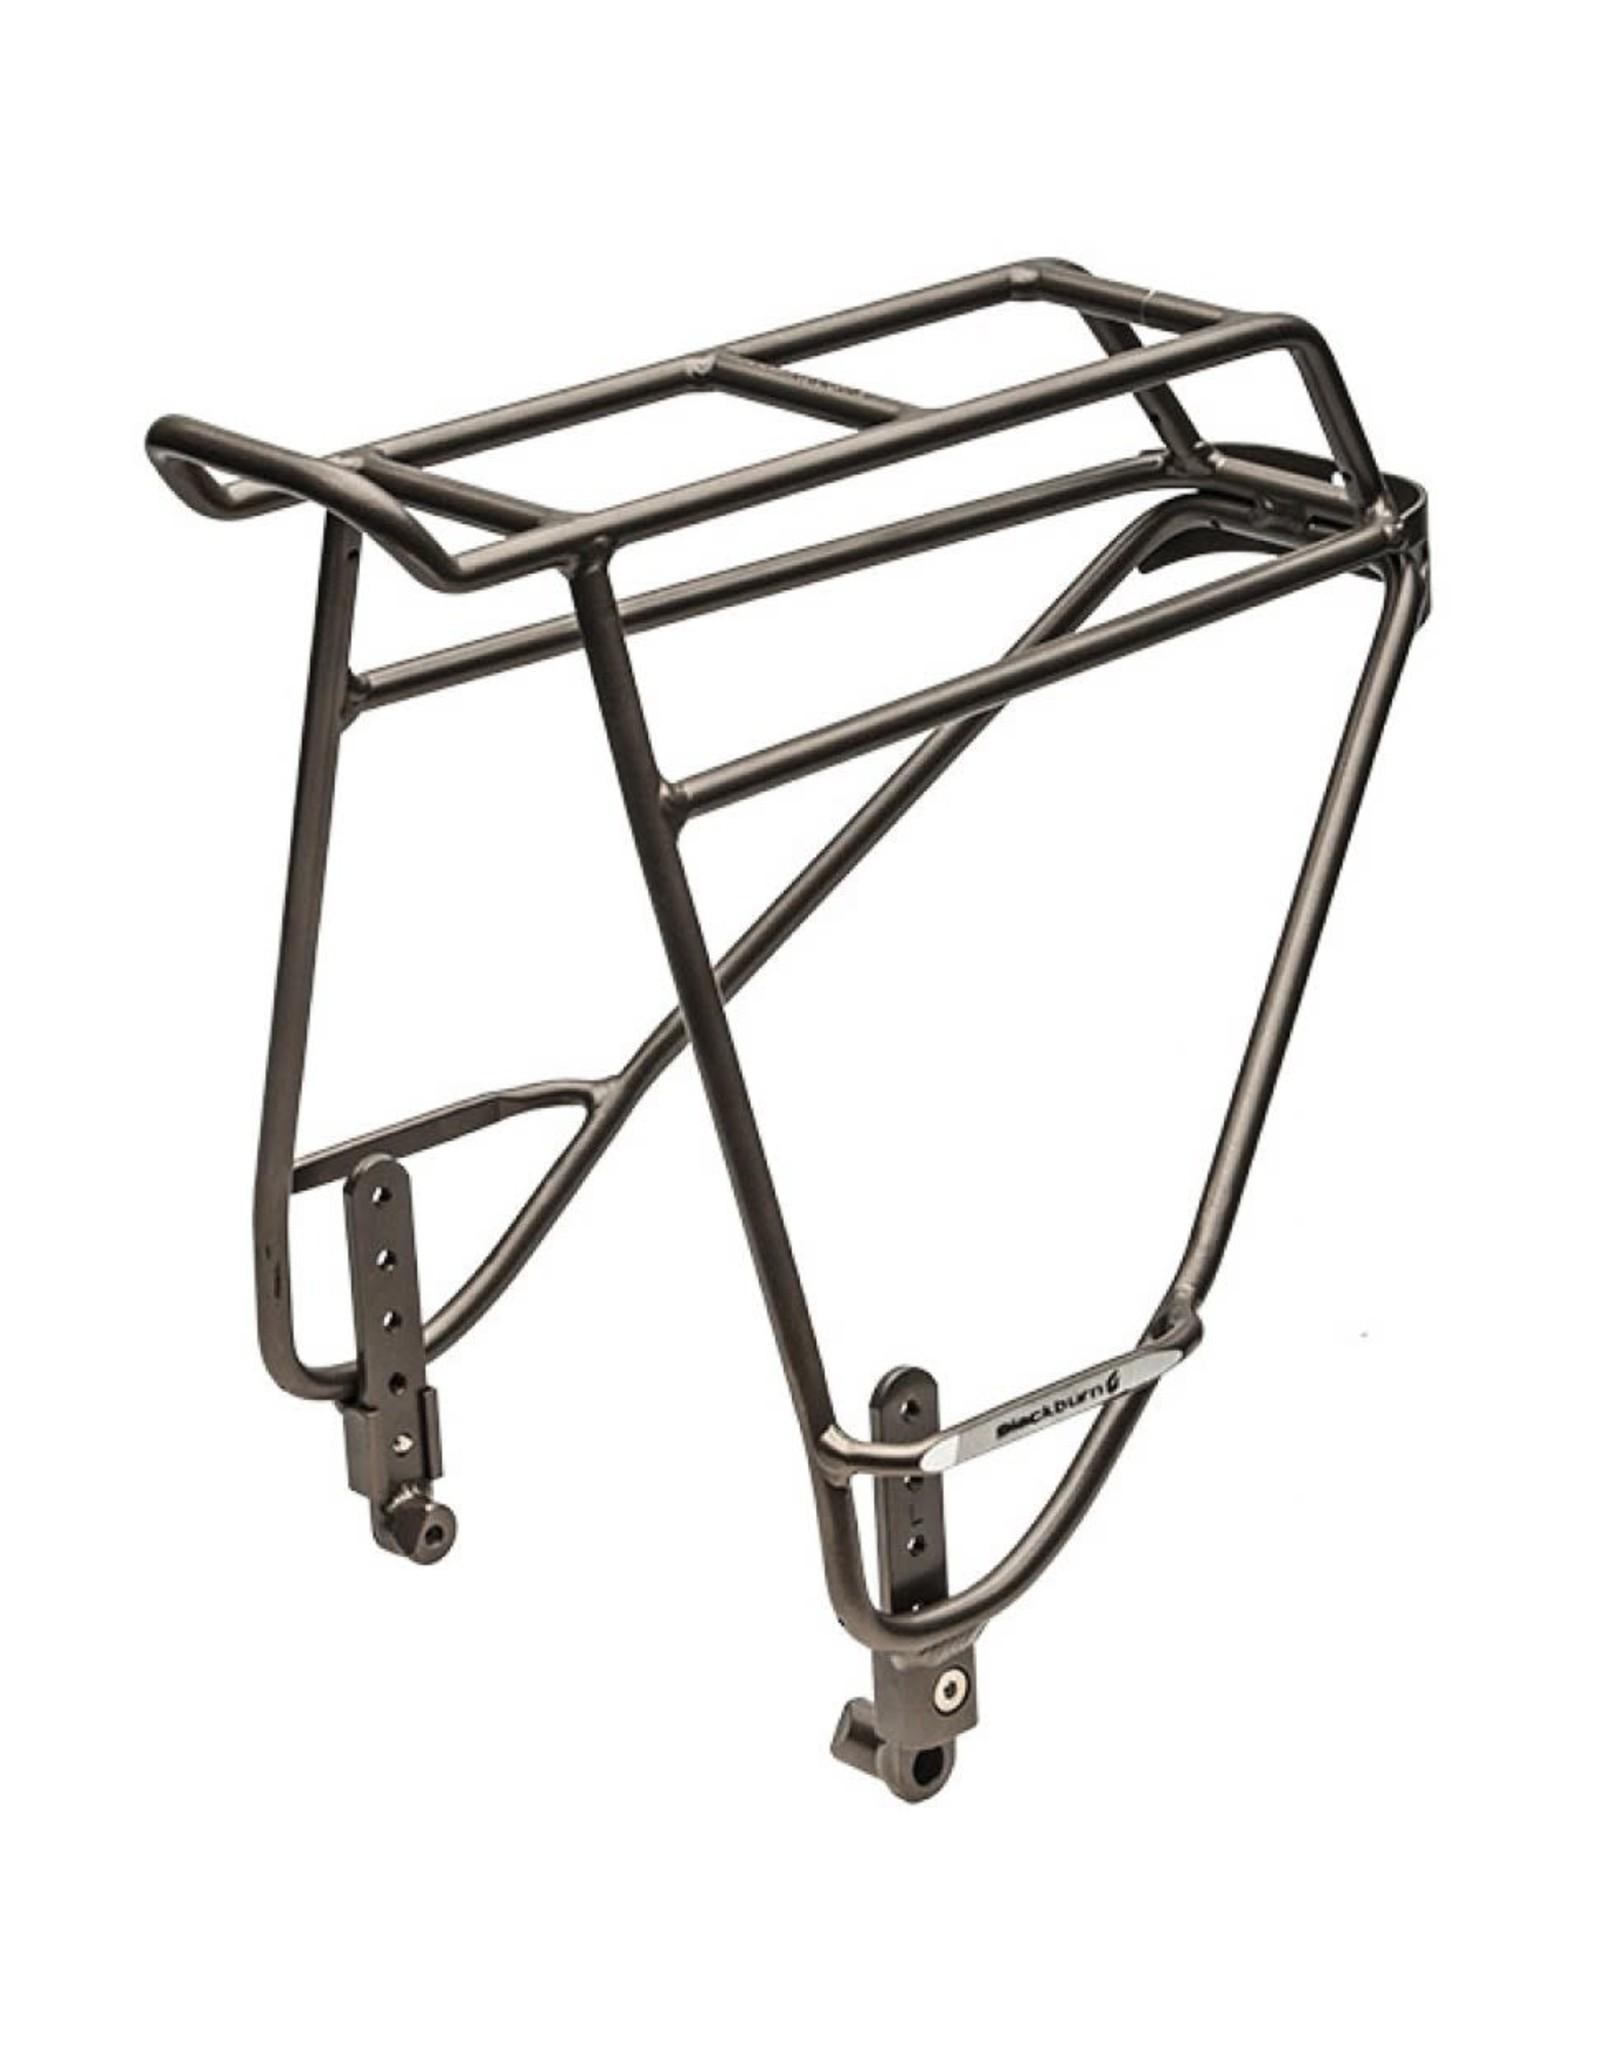 Blackburn OUTPOST Rear Rack